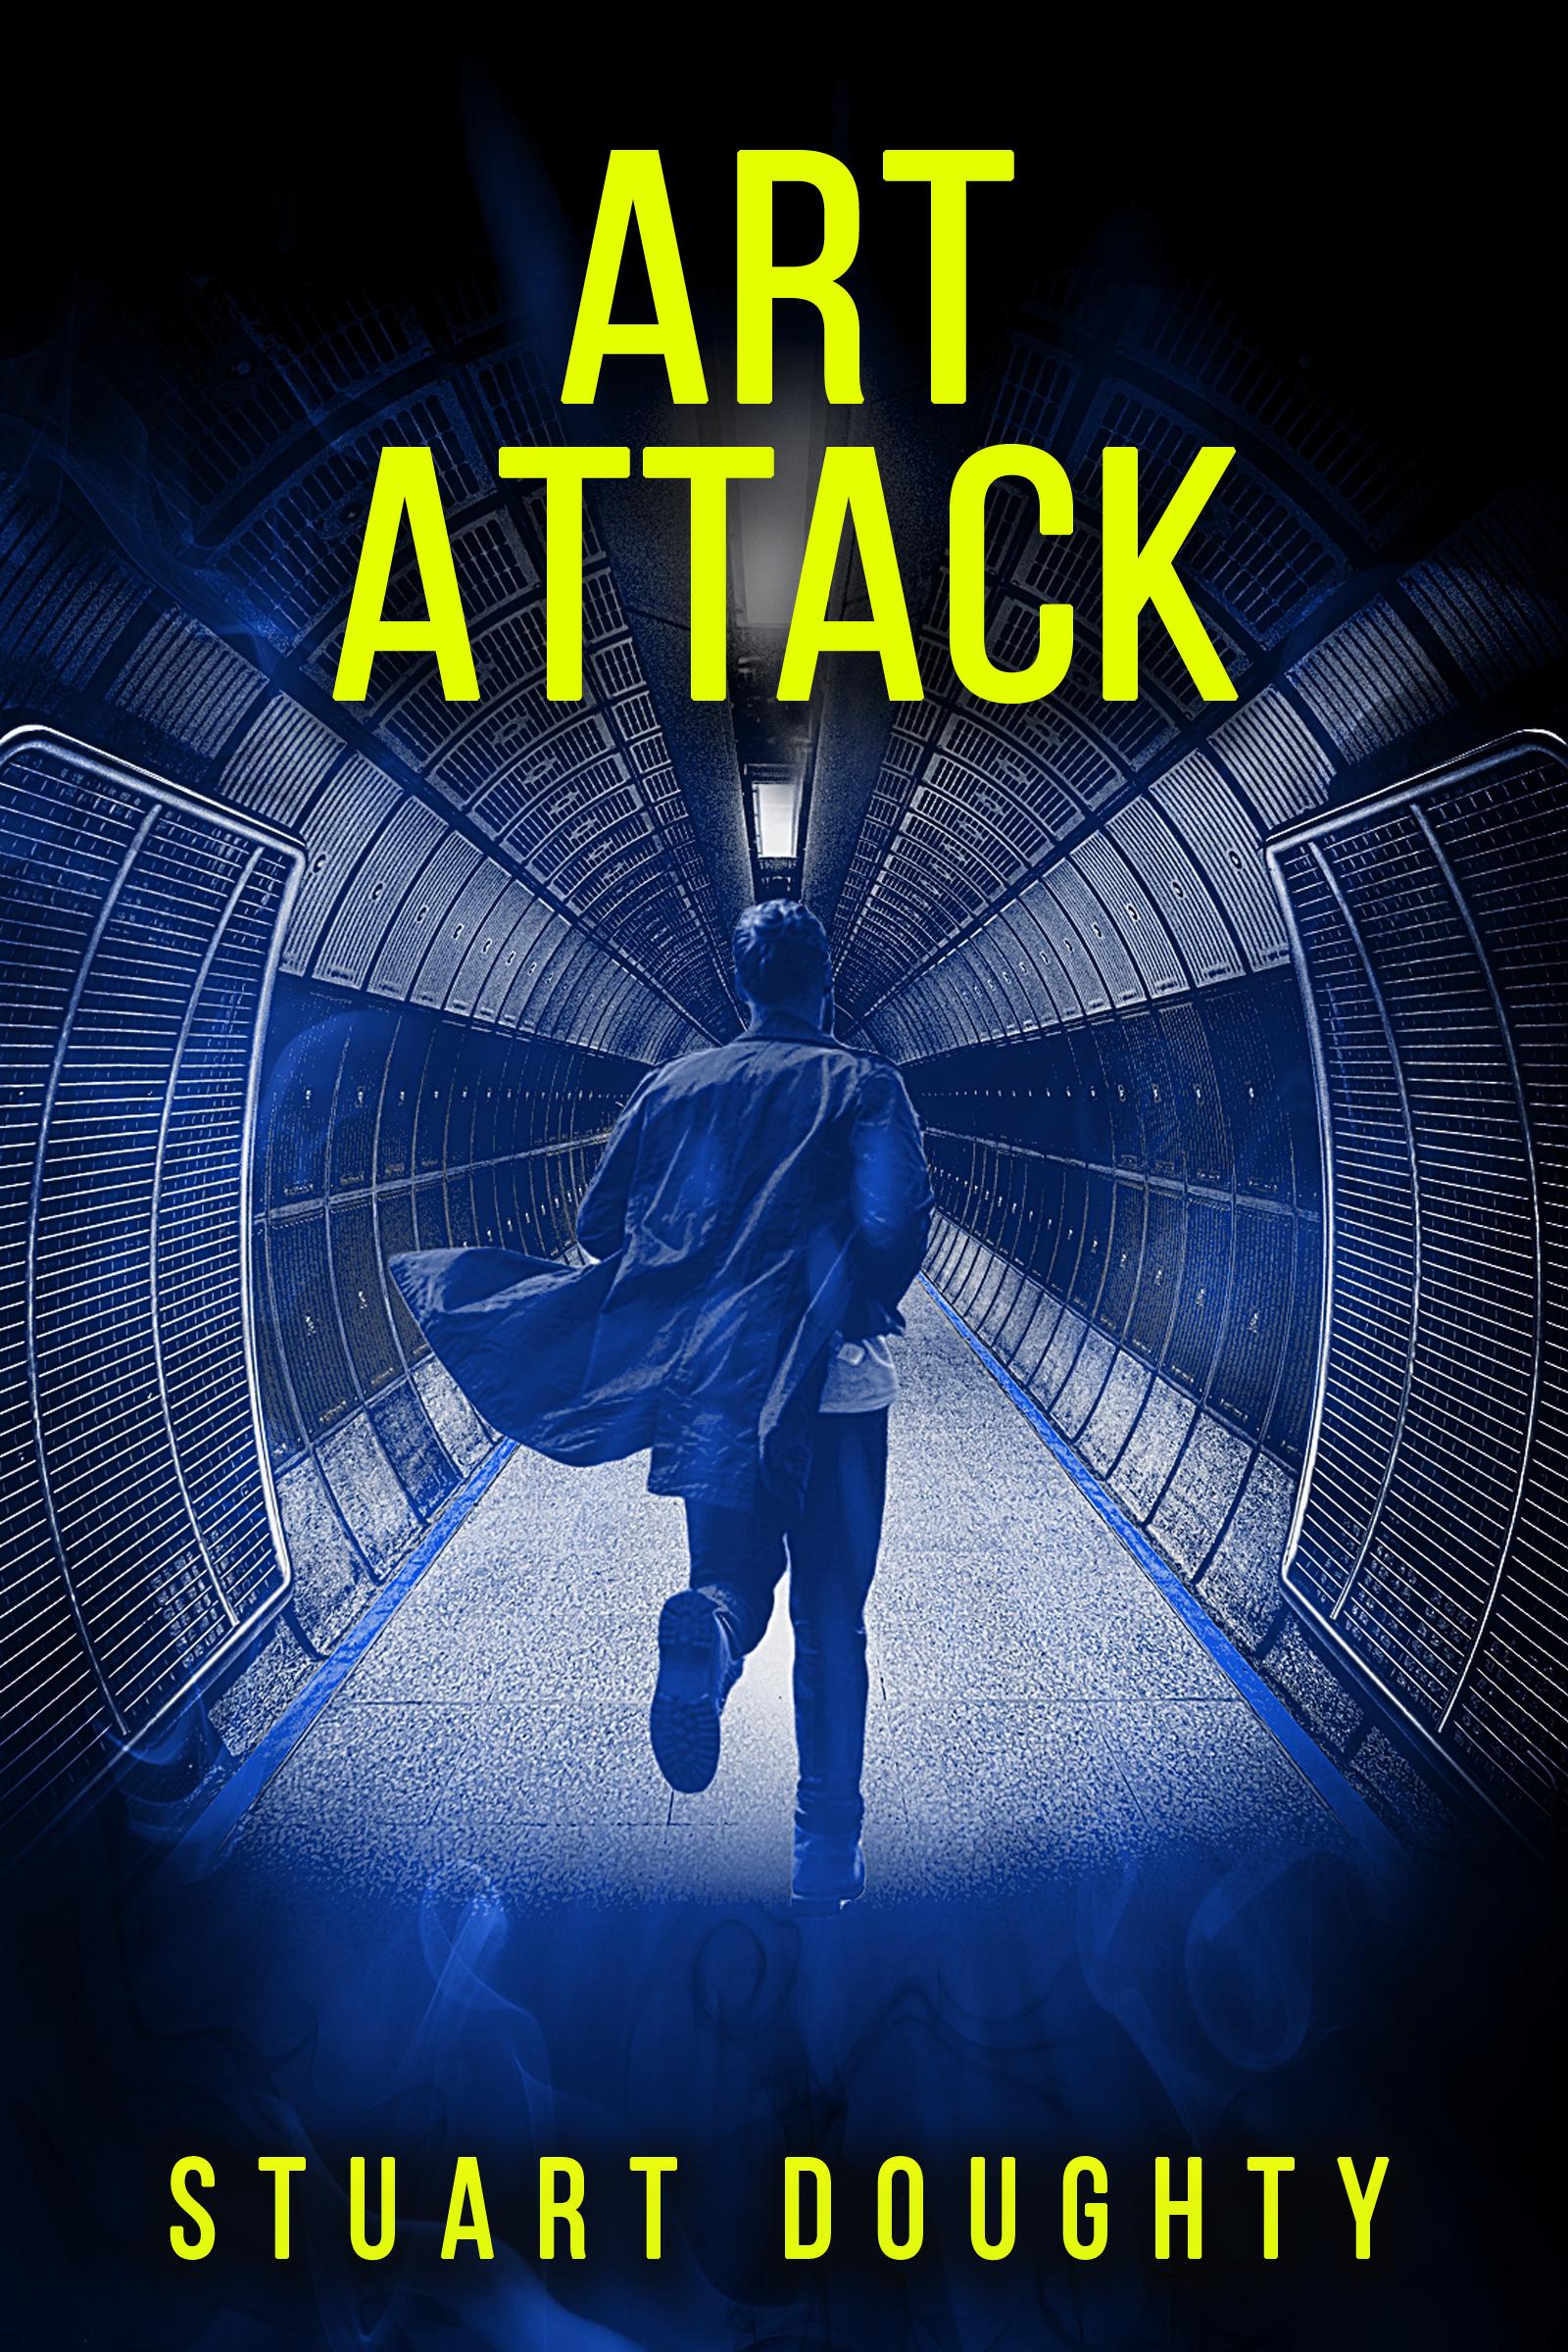 Art-Attack-cover.jpg